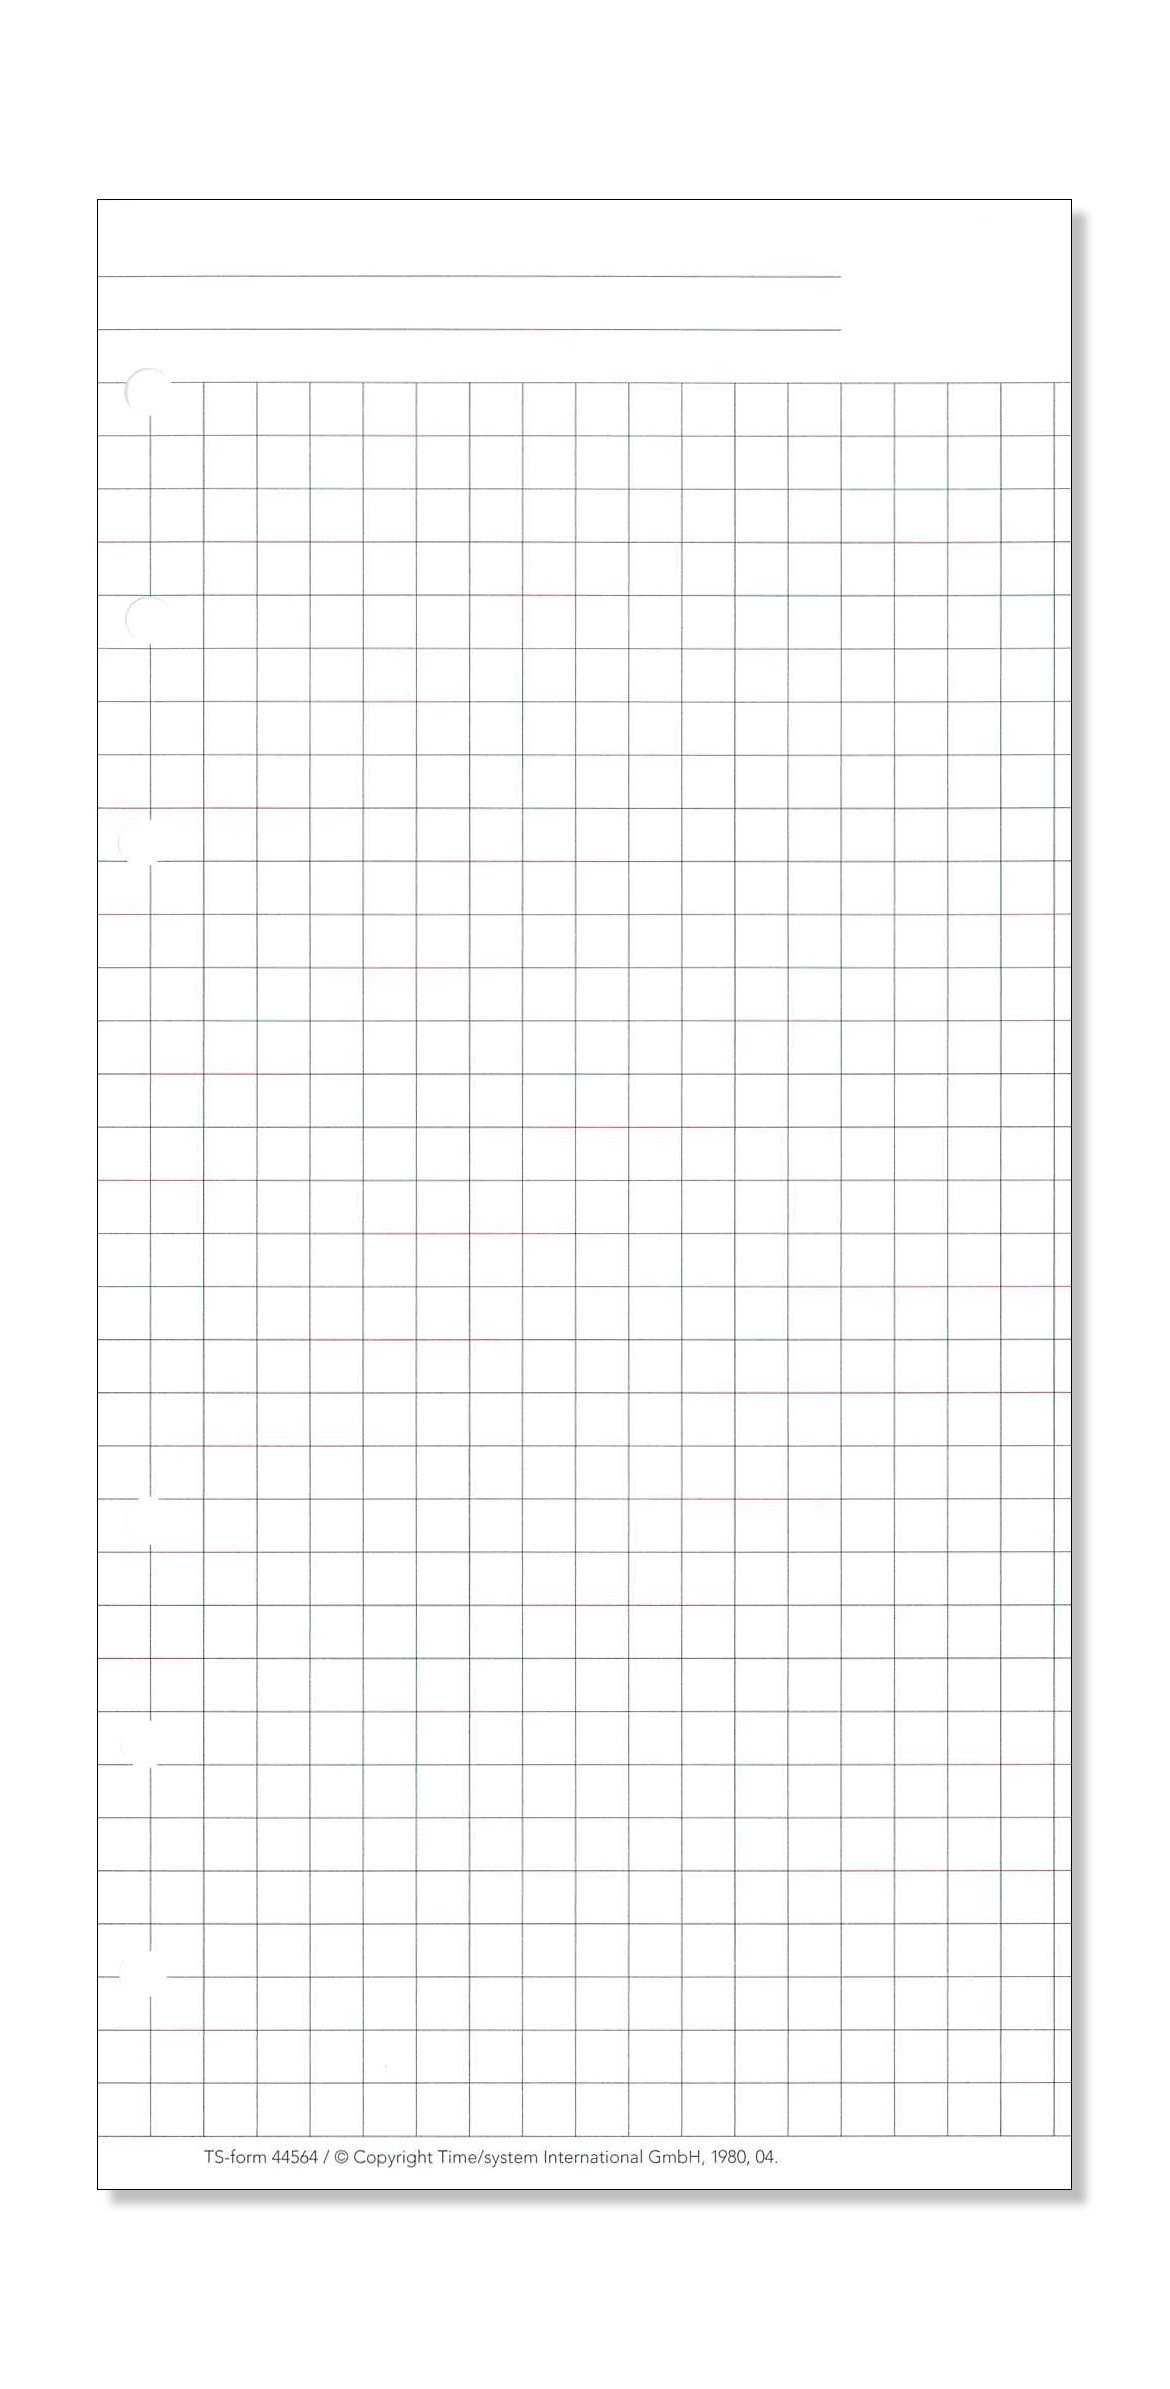 Time/system Compact Formblatt Kariertes Papier ganzes Kariertes Papier Pdf